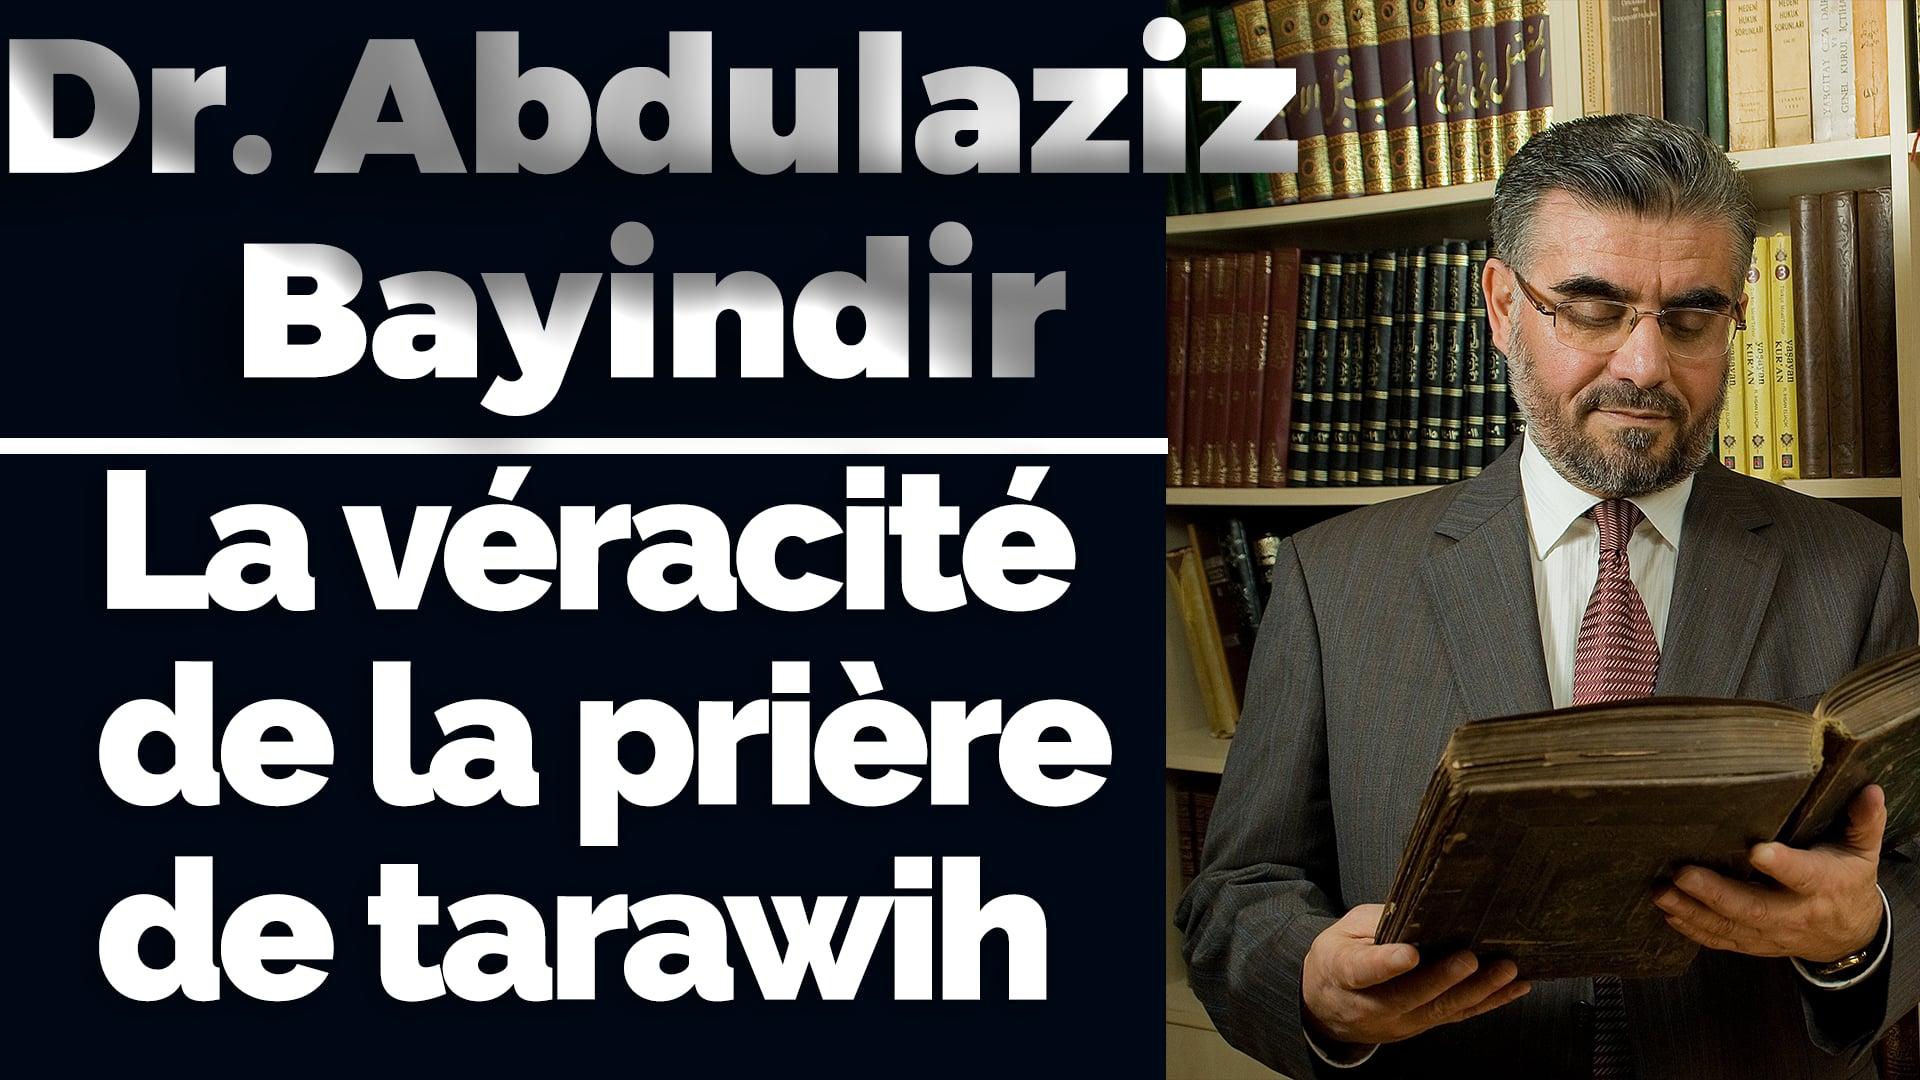 Dr Abdulaziz Bayindir (Turc) : La véracité de la prière de tarawih